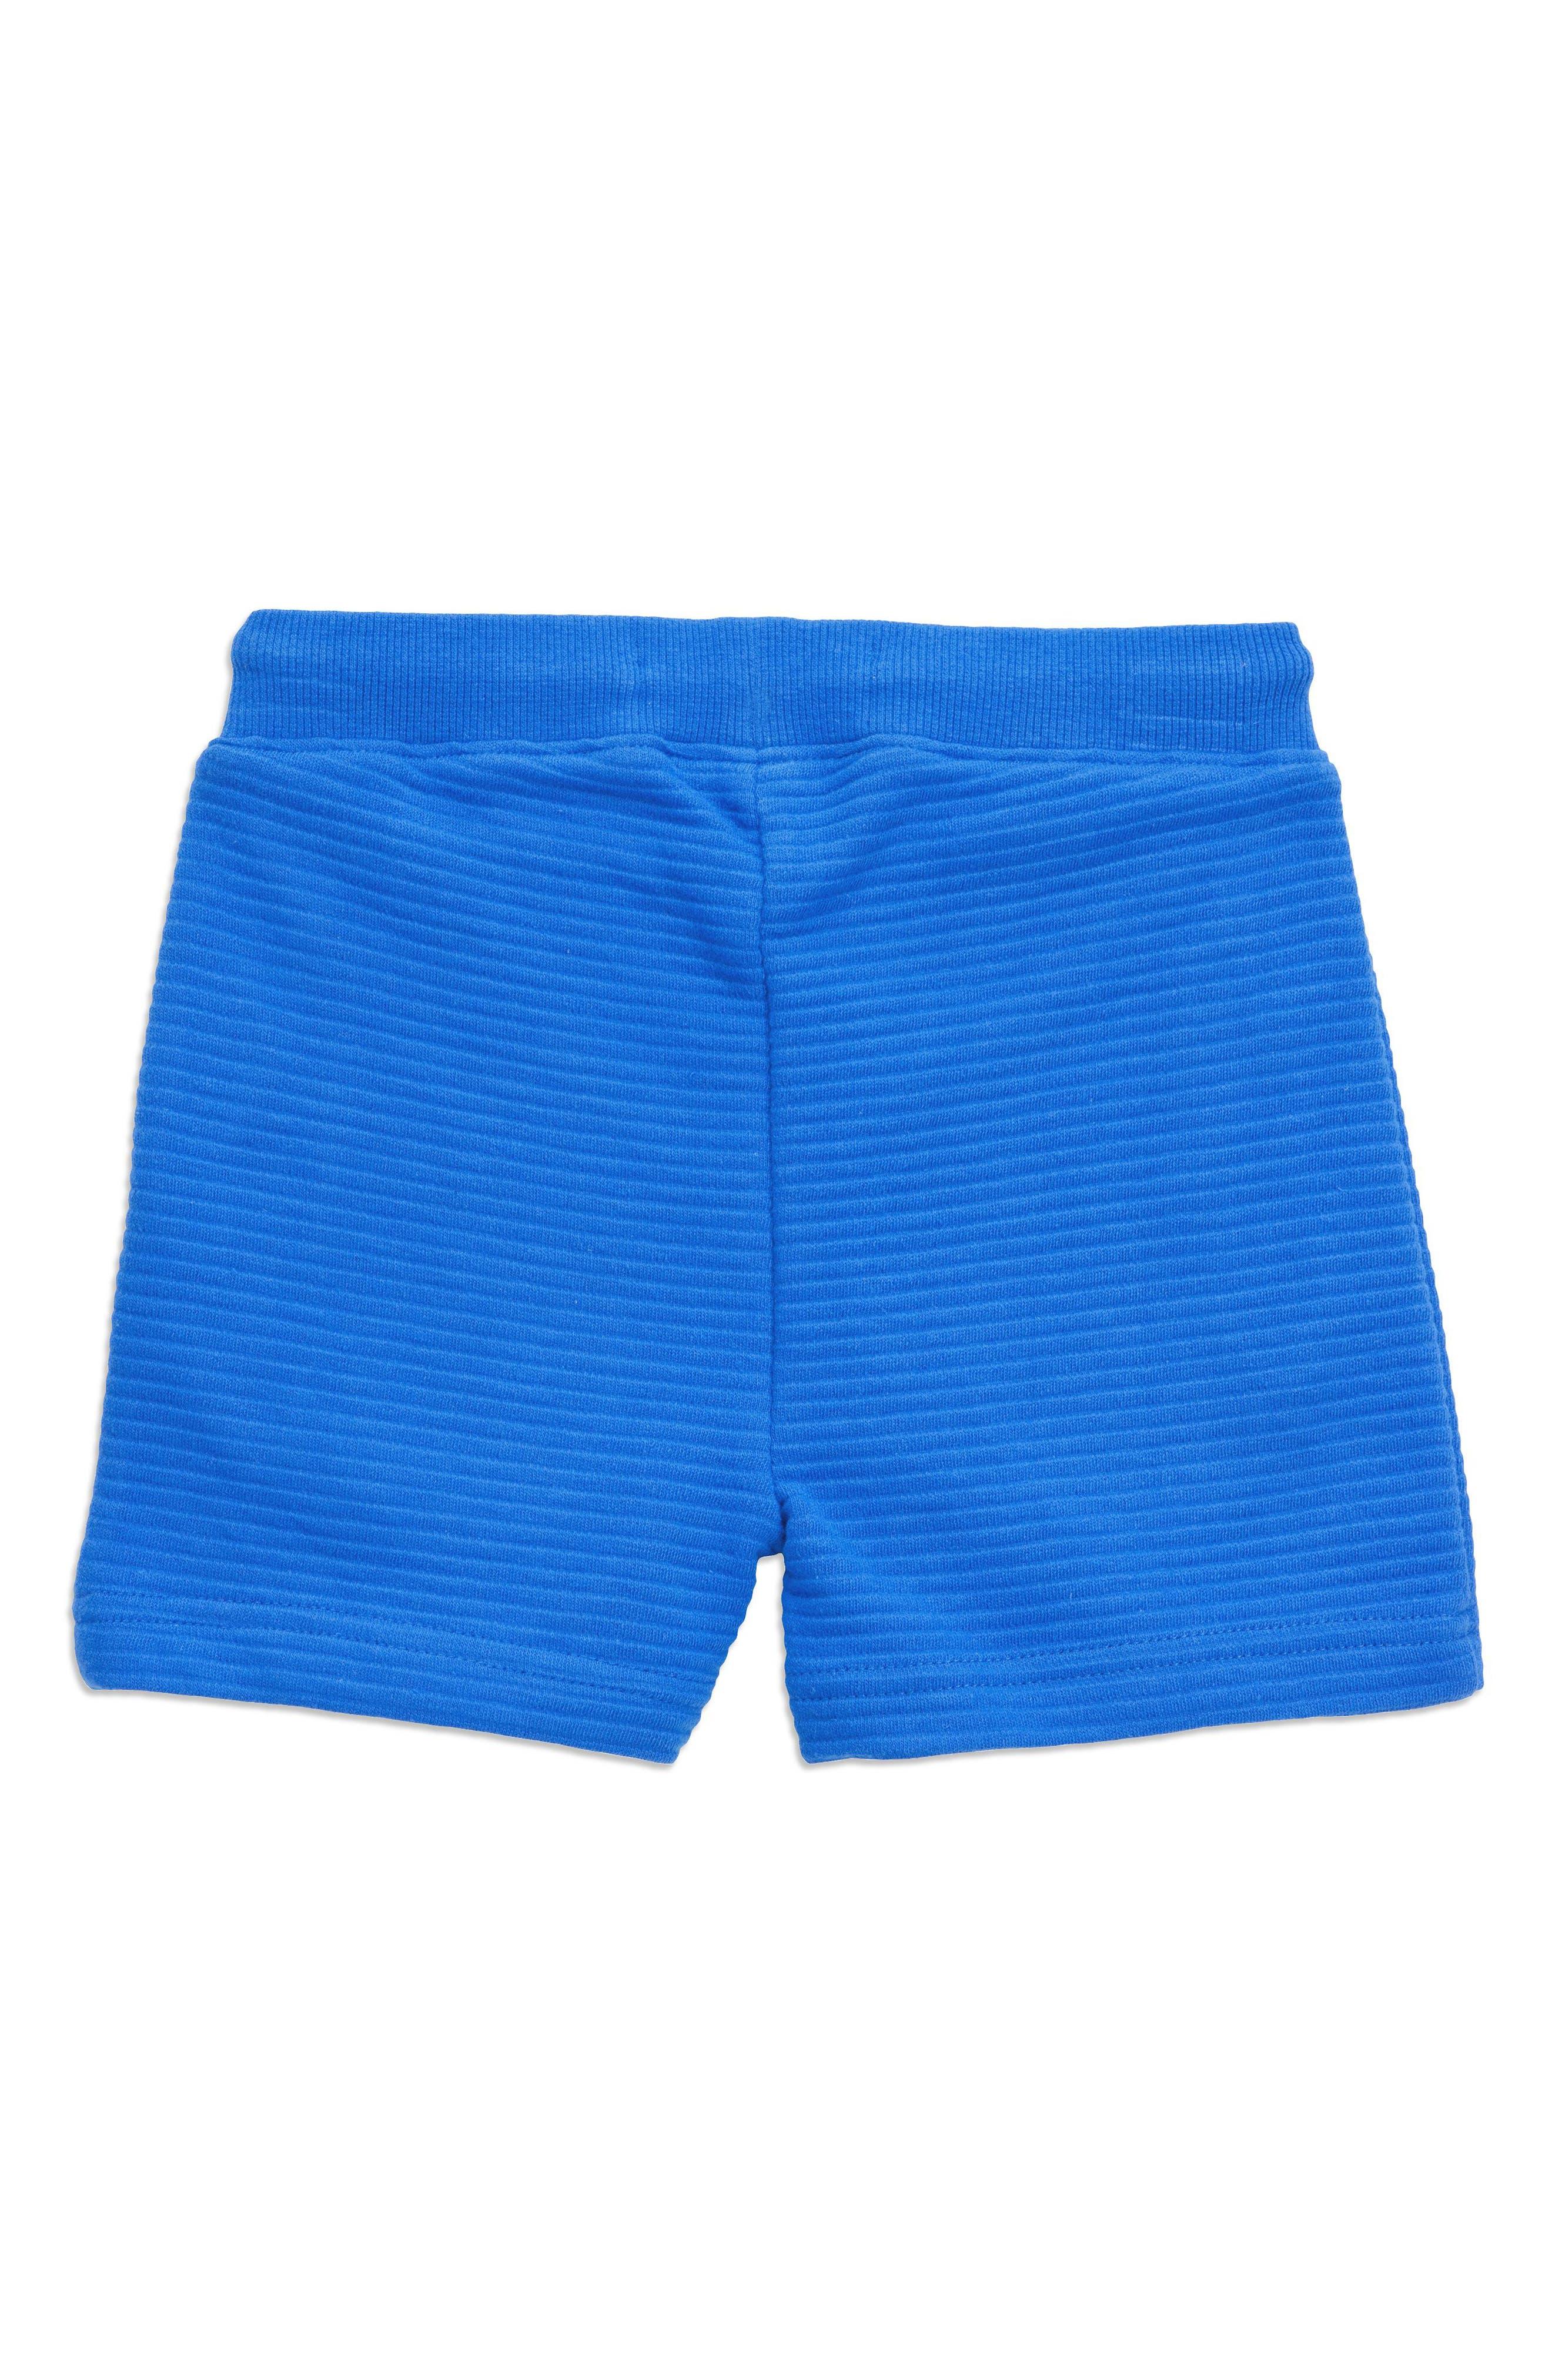 Academy Shorts,                             Alternate thumbnail 2, color,                             Cobalt